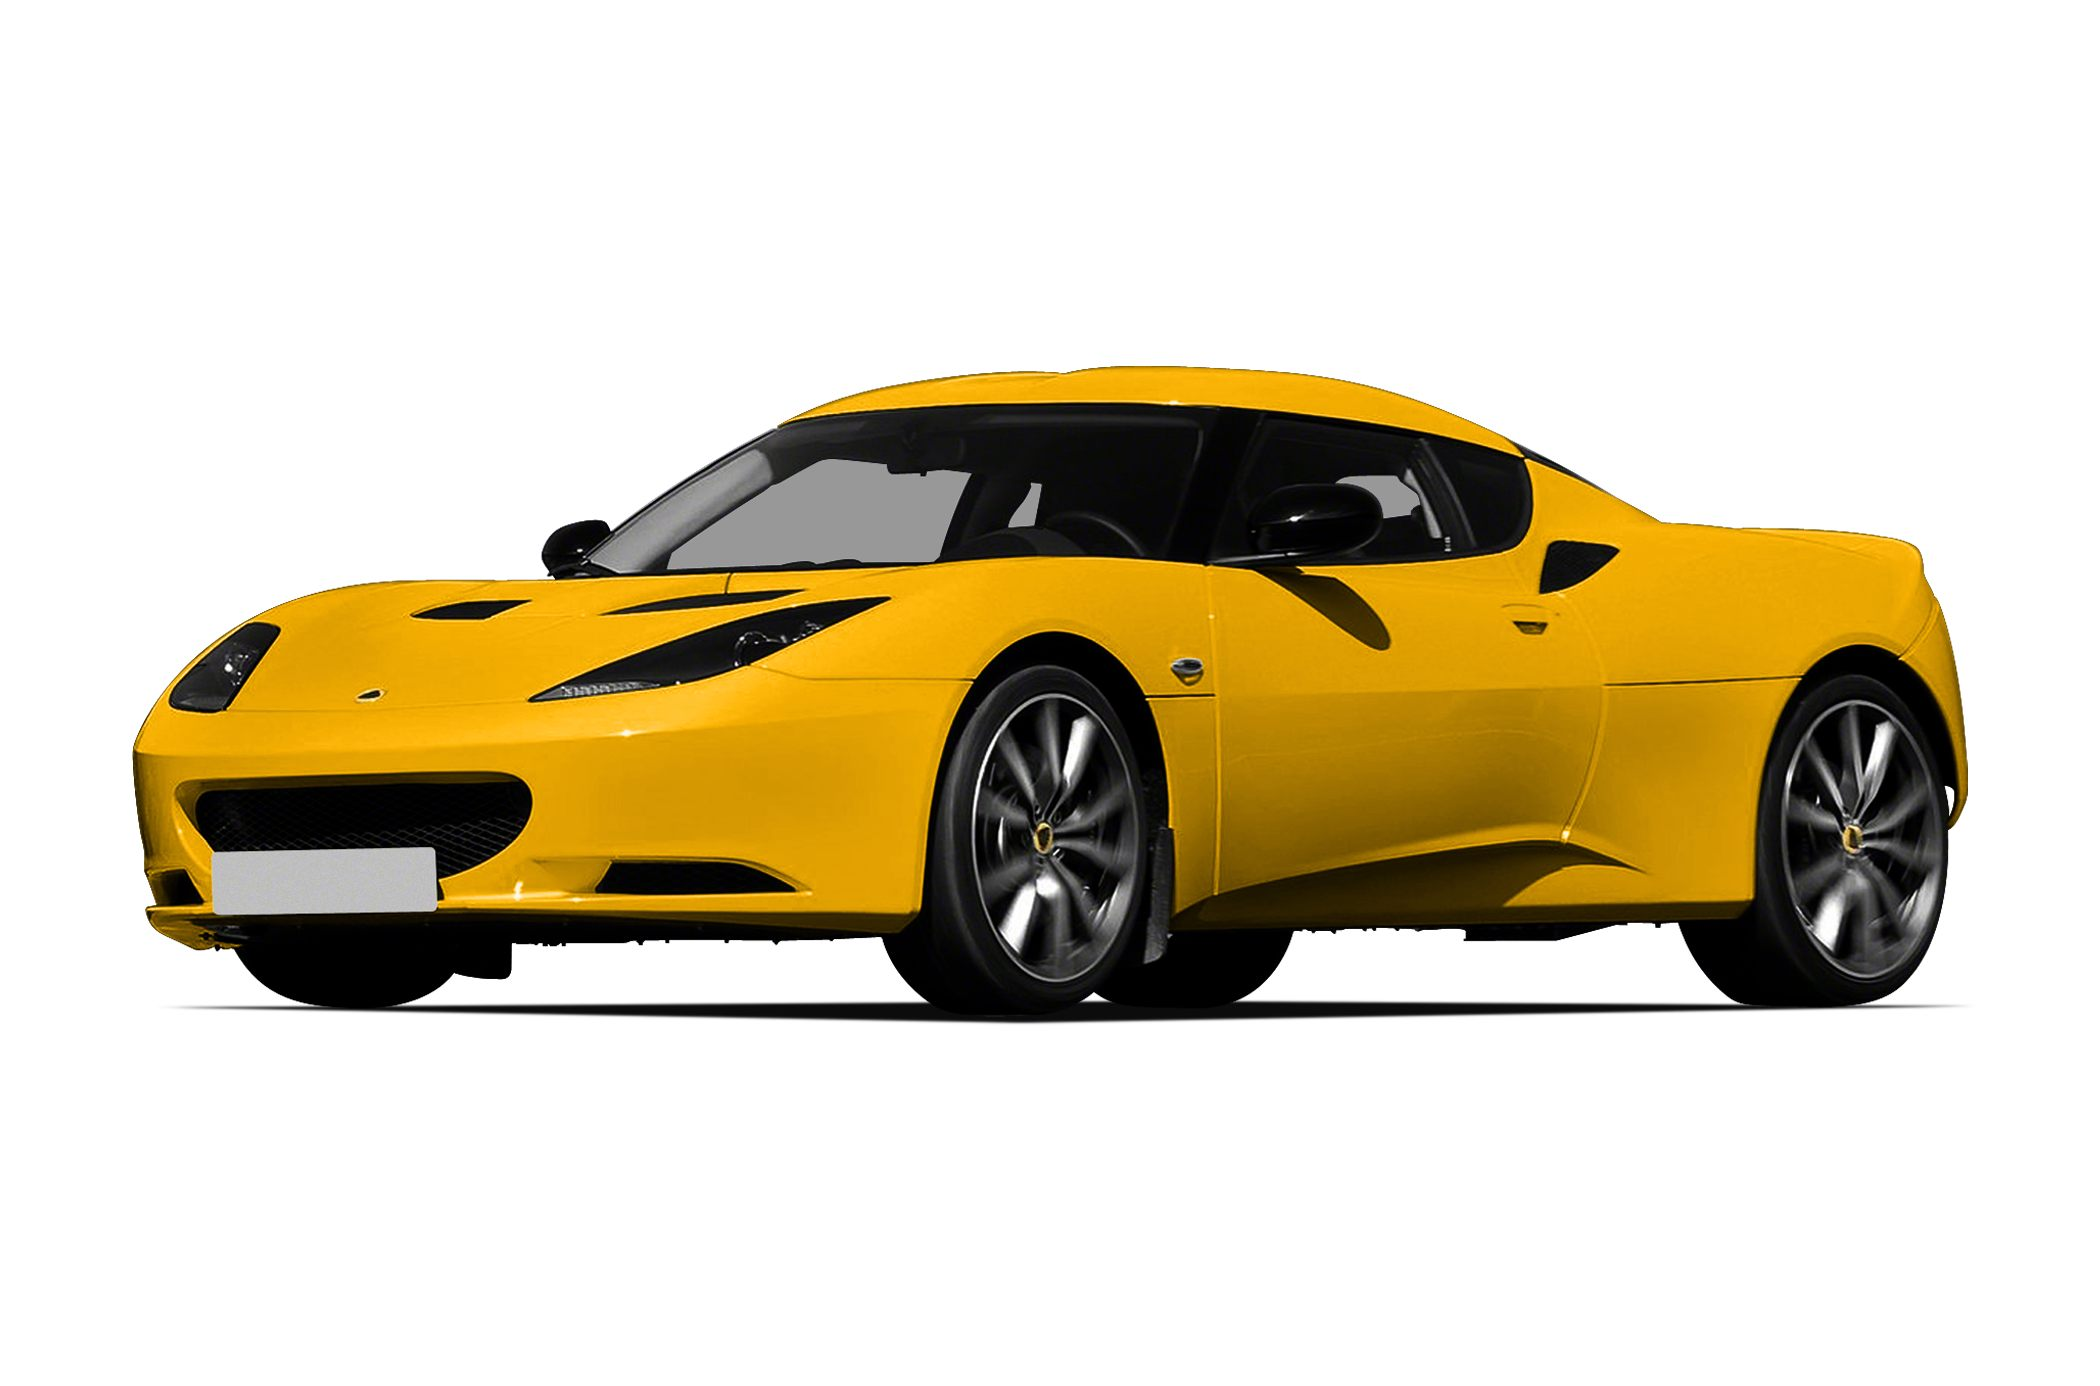 2011 Lotus Evora S 22 ONLY 14802 Miles S 22 trim Leather iPodMP3 Input Premium Sound Syste